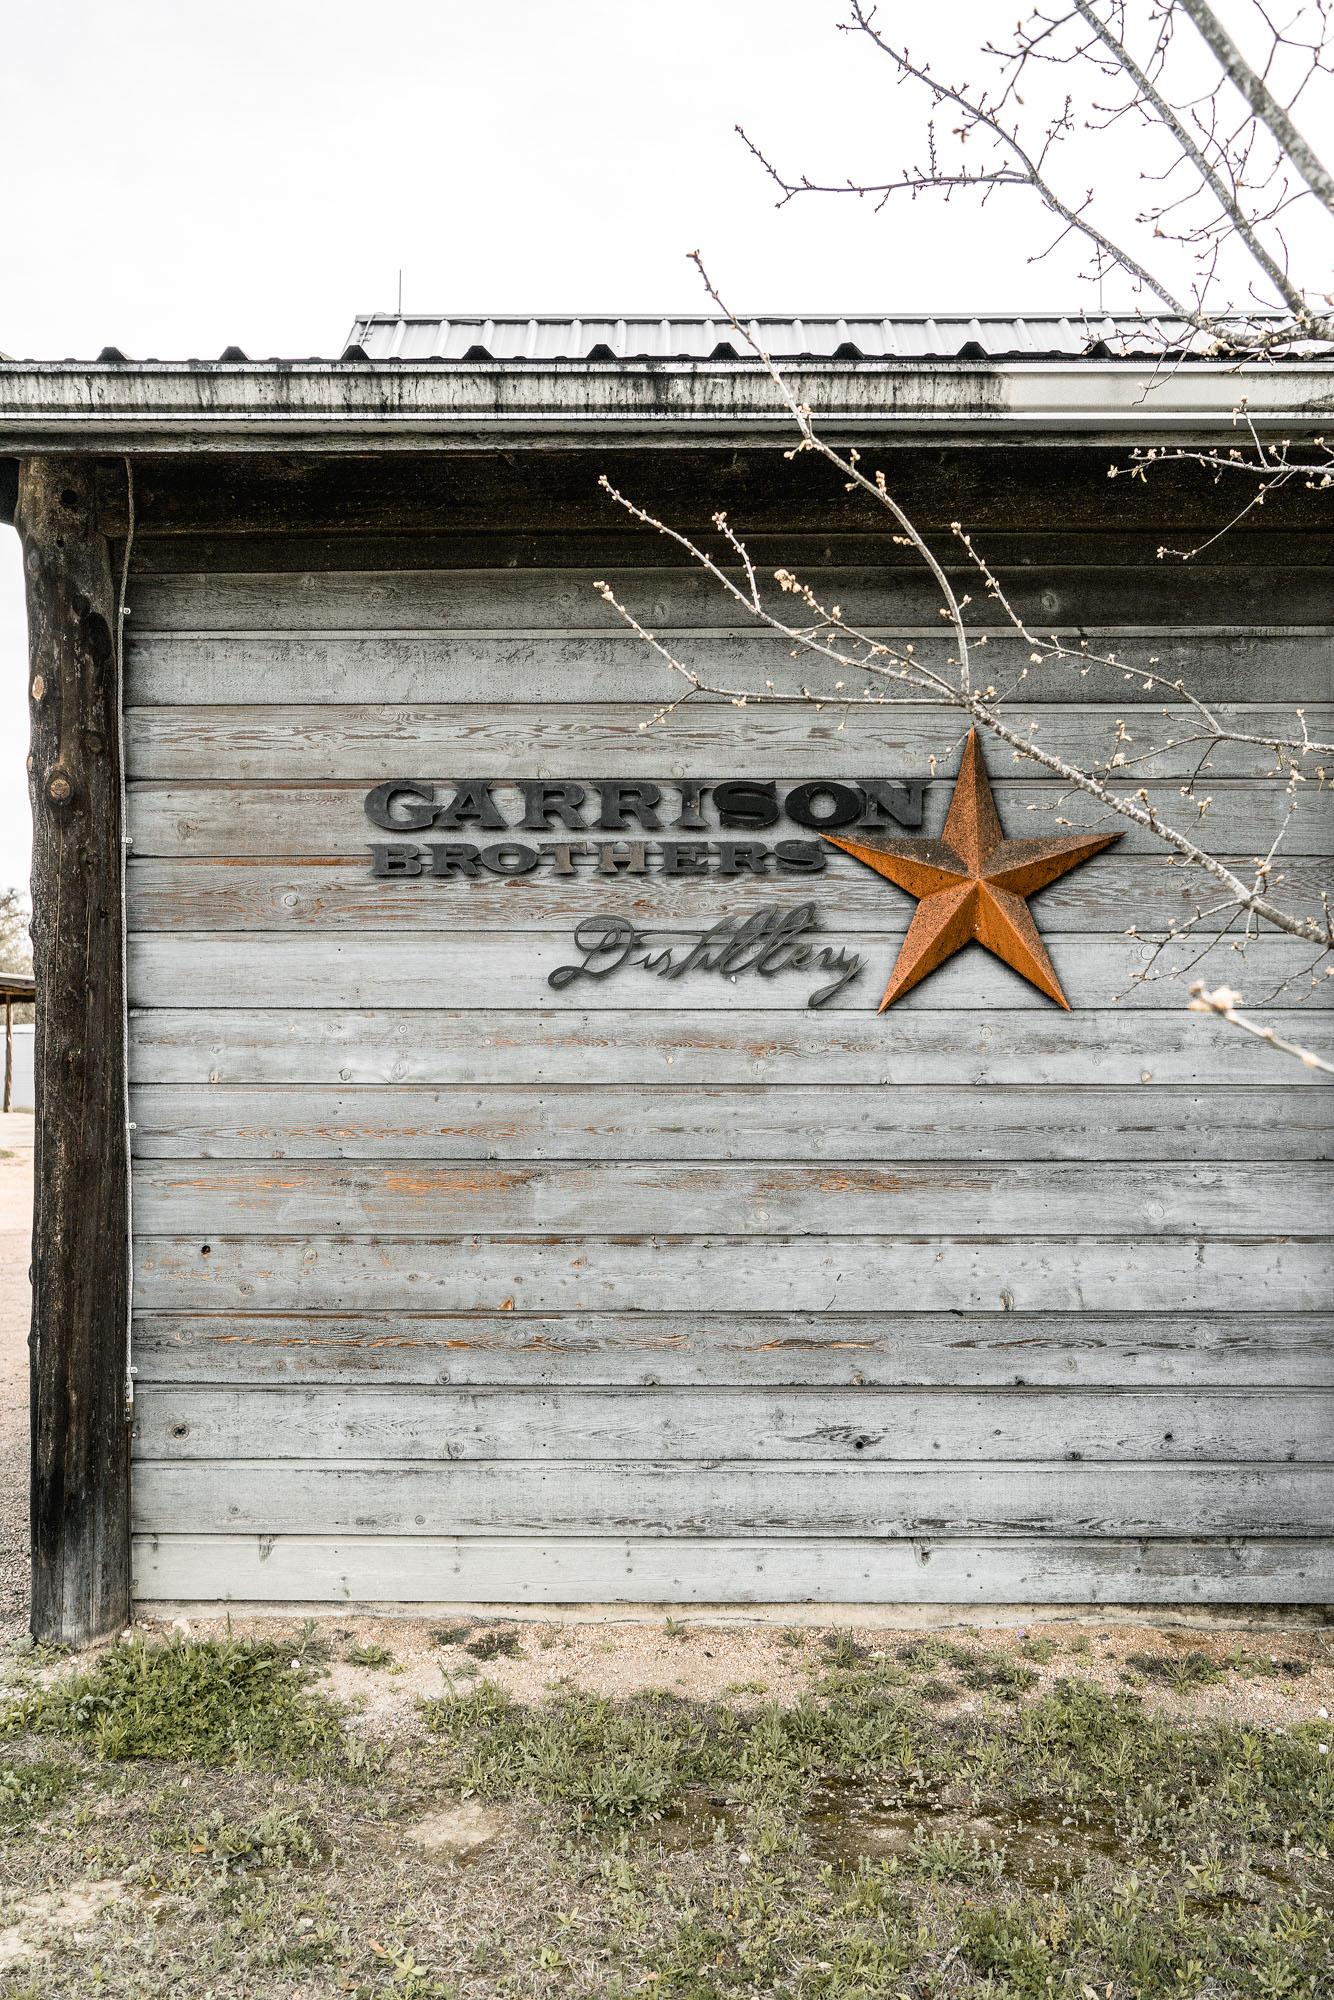 neathery_garrison_brothers_balmorhea-44.jpg